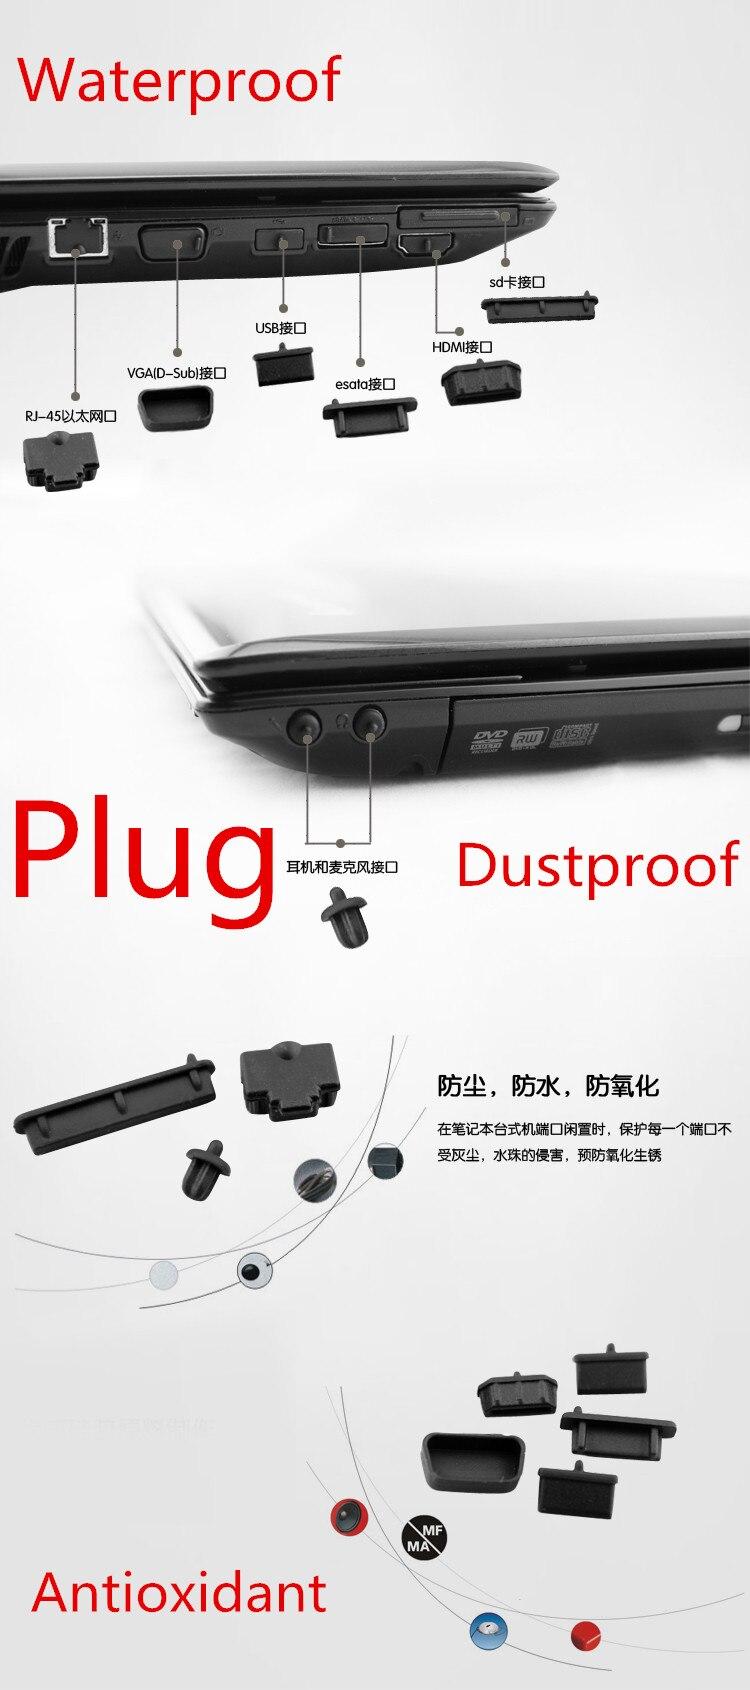 Waterproof Dustproof Laptop Black Silicone Plug Port Cover For 2019 Release Alienware Area-51m M15 M17/M15 R2/M17 R2